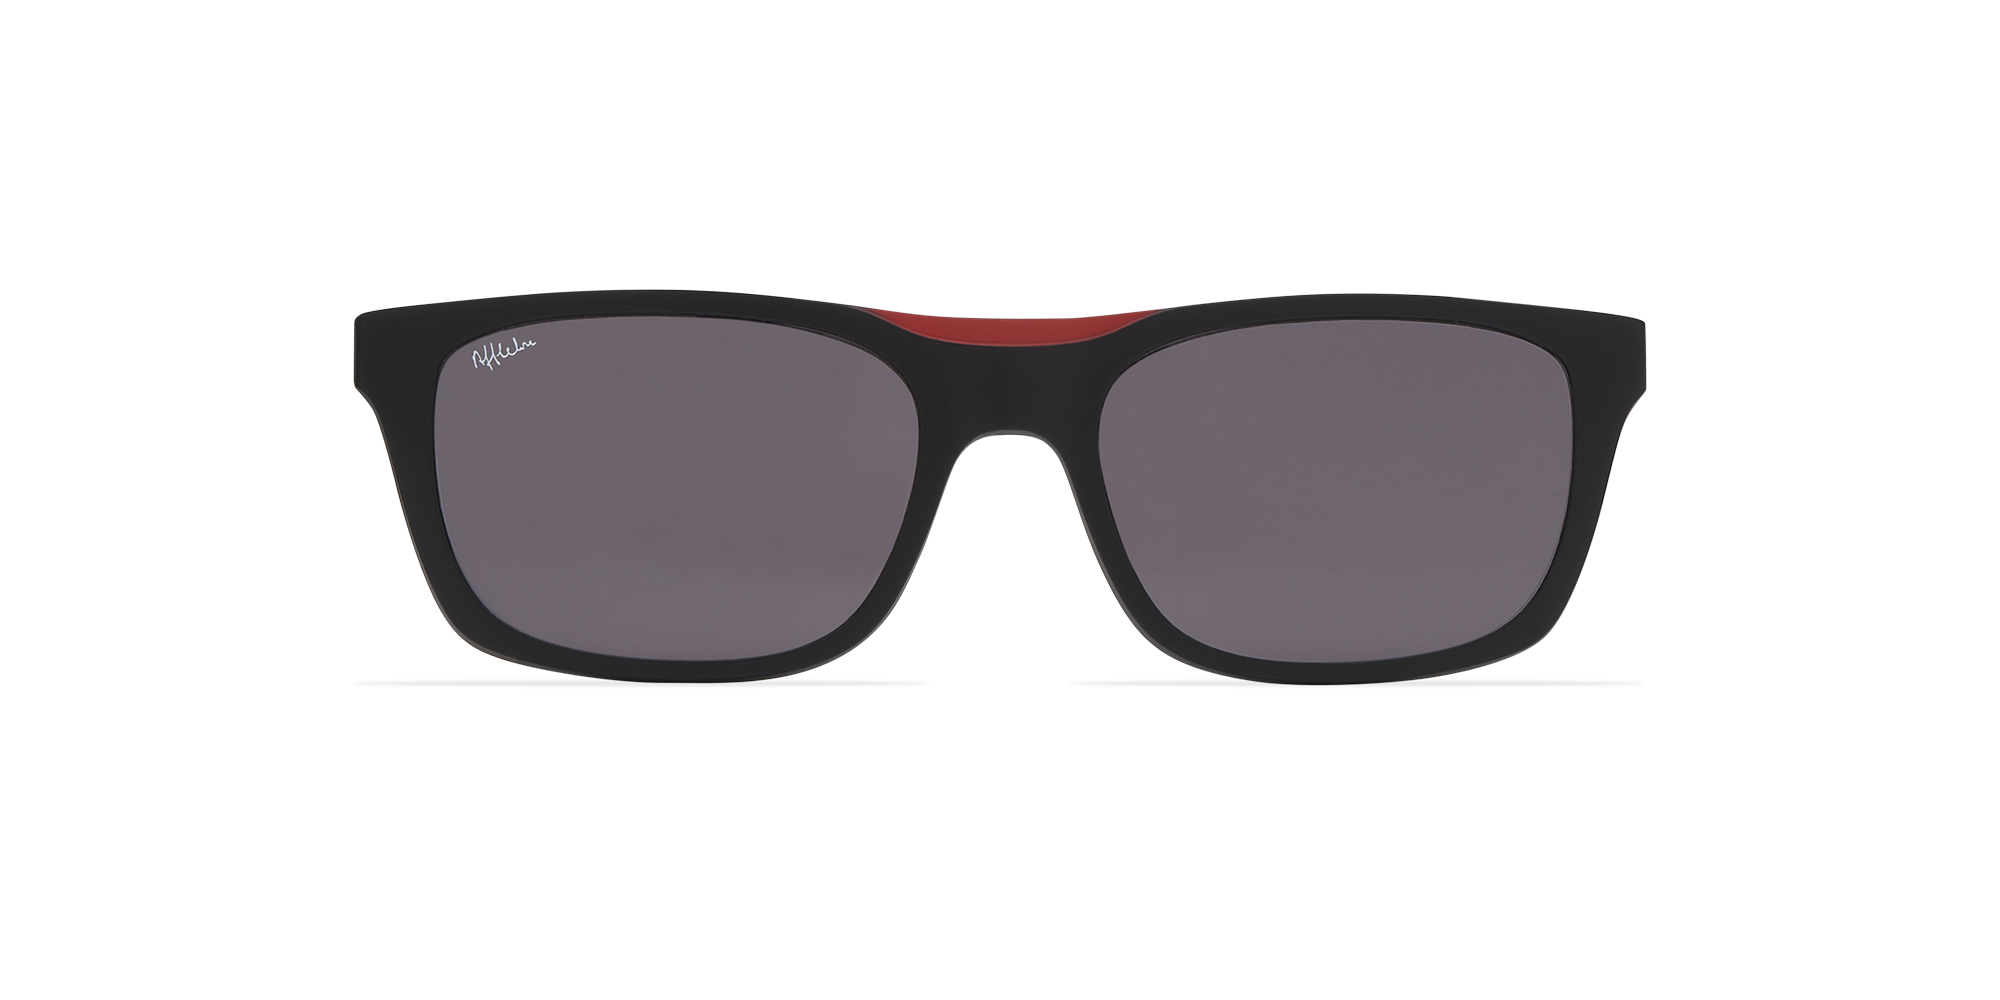 afflelou/france/products/smart_clip/clips_glasses/TMK32XLBK015316.png